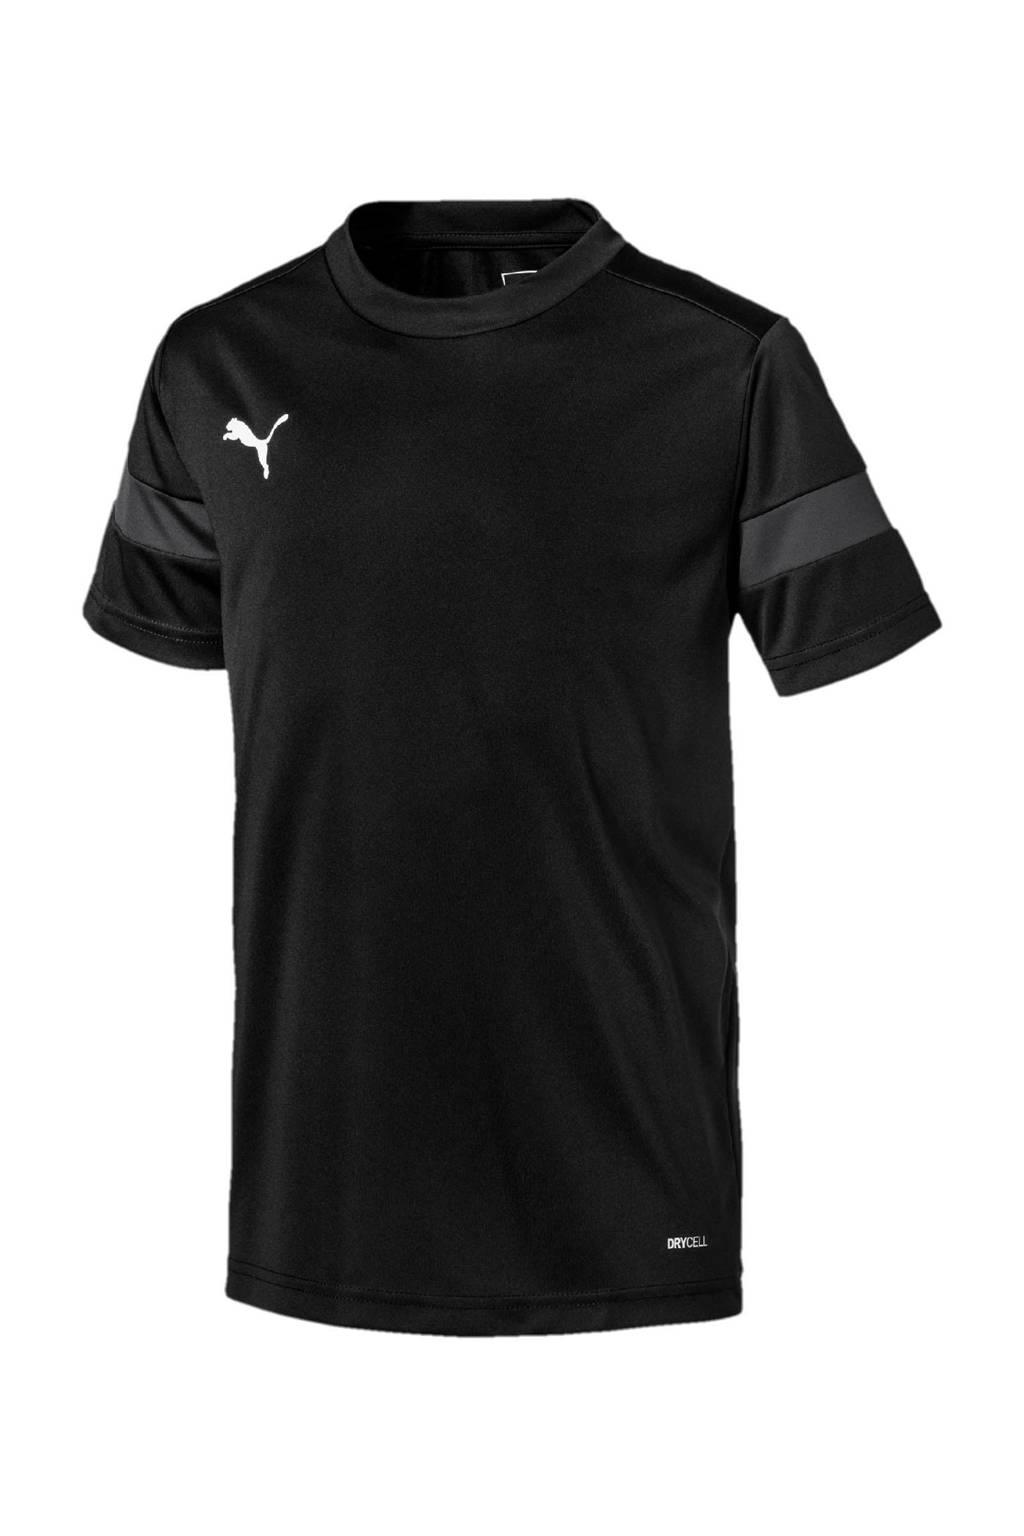 Puma Junior  voetbalshirt zwart/grijs, Zwart/grijs